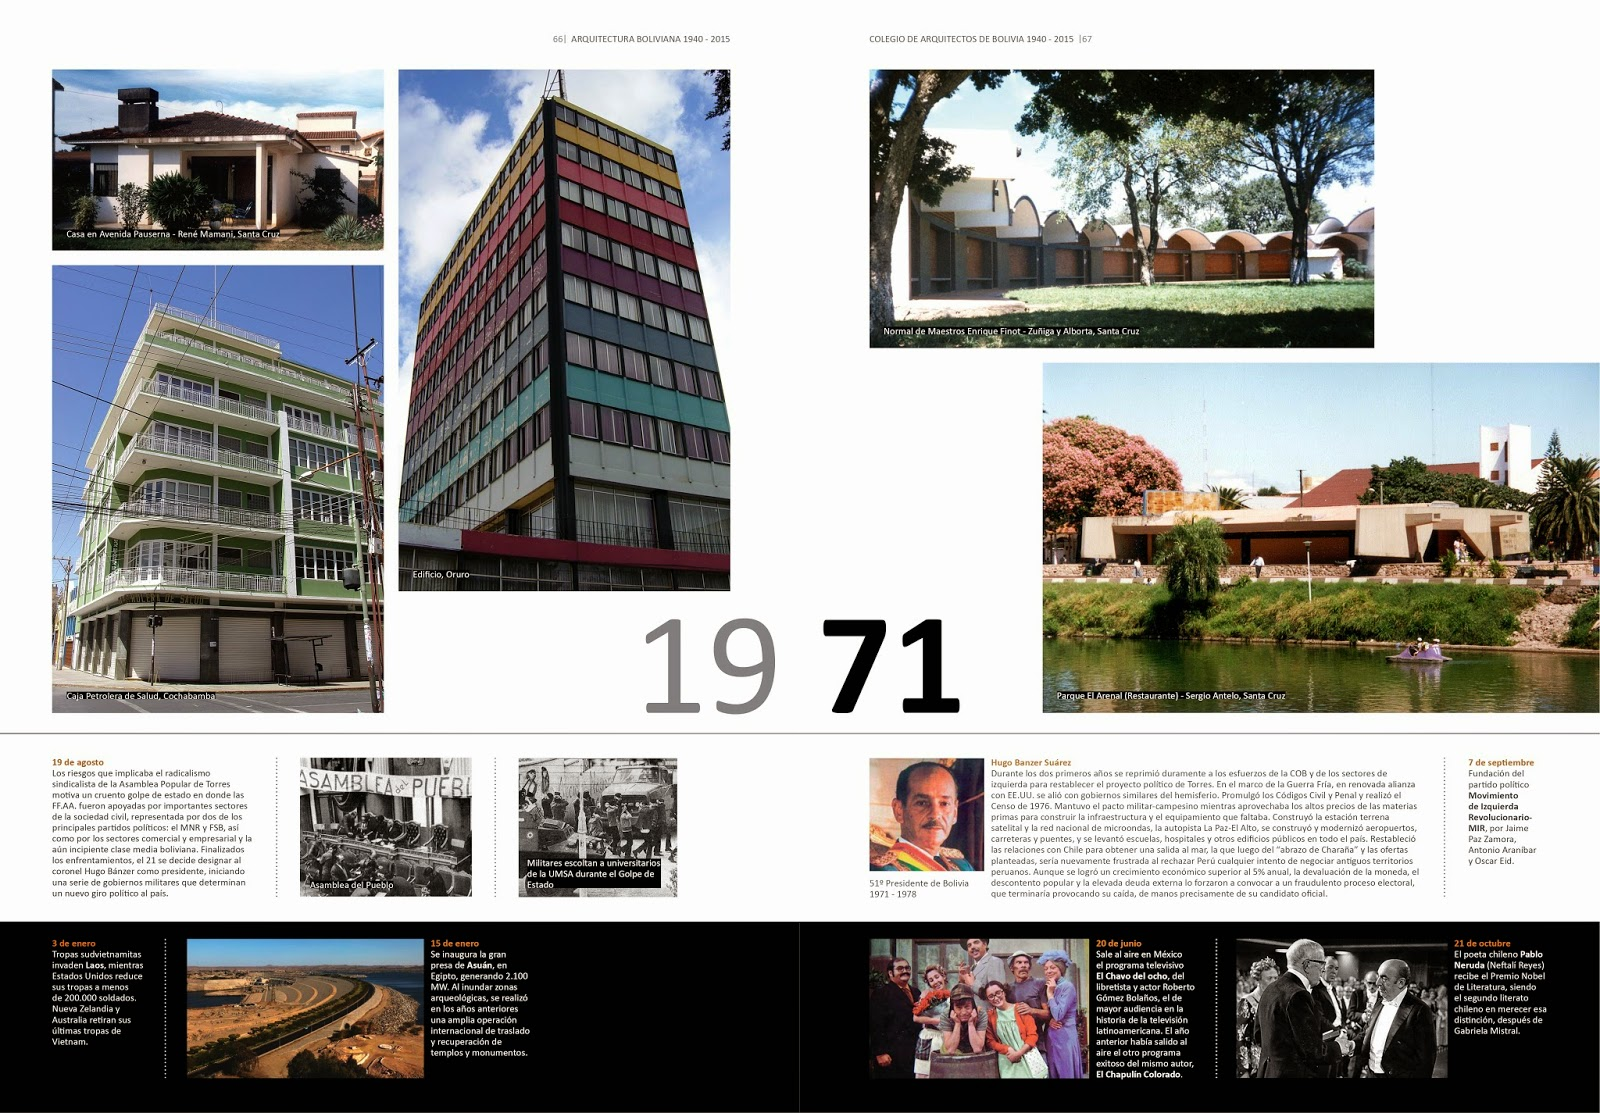 Victor hugo limpias libro arquitectura boliviana 1940 2015 for Arquitectos de la arquitectura moderna